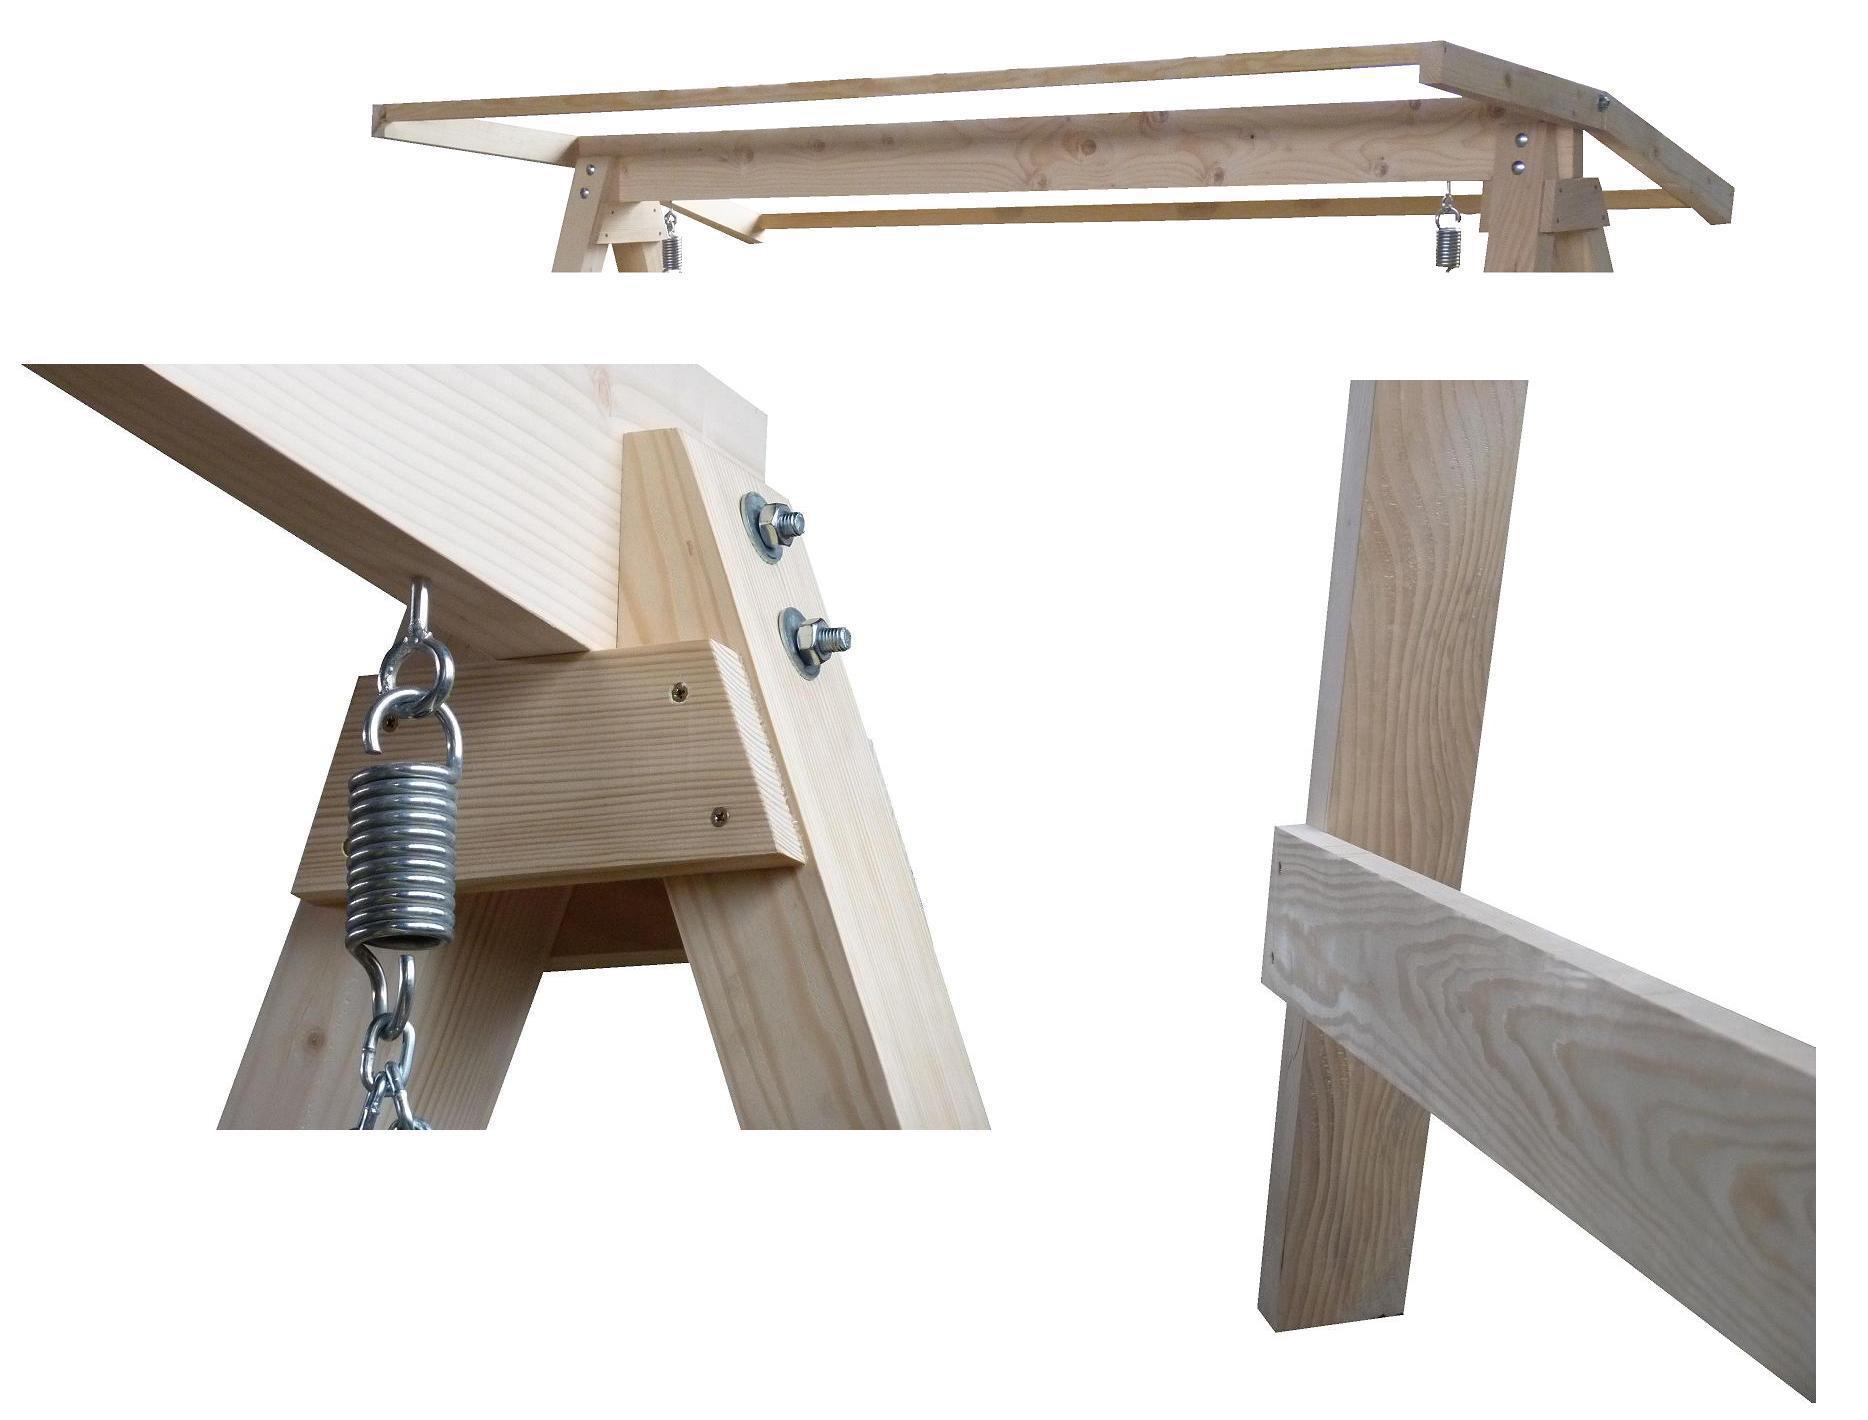 Hustawka Ogrodowa Drewniana Budowa : Huśtawka drewniana ogrodowa 4 osobowa  2 kolory , Ogród, Huśtawki